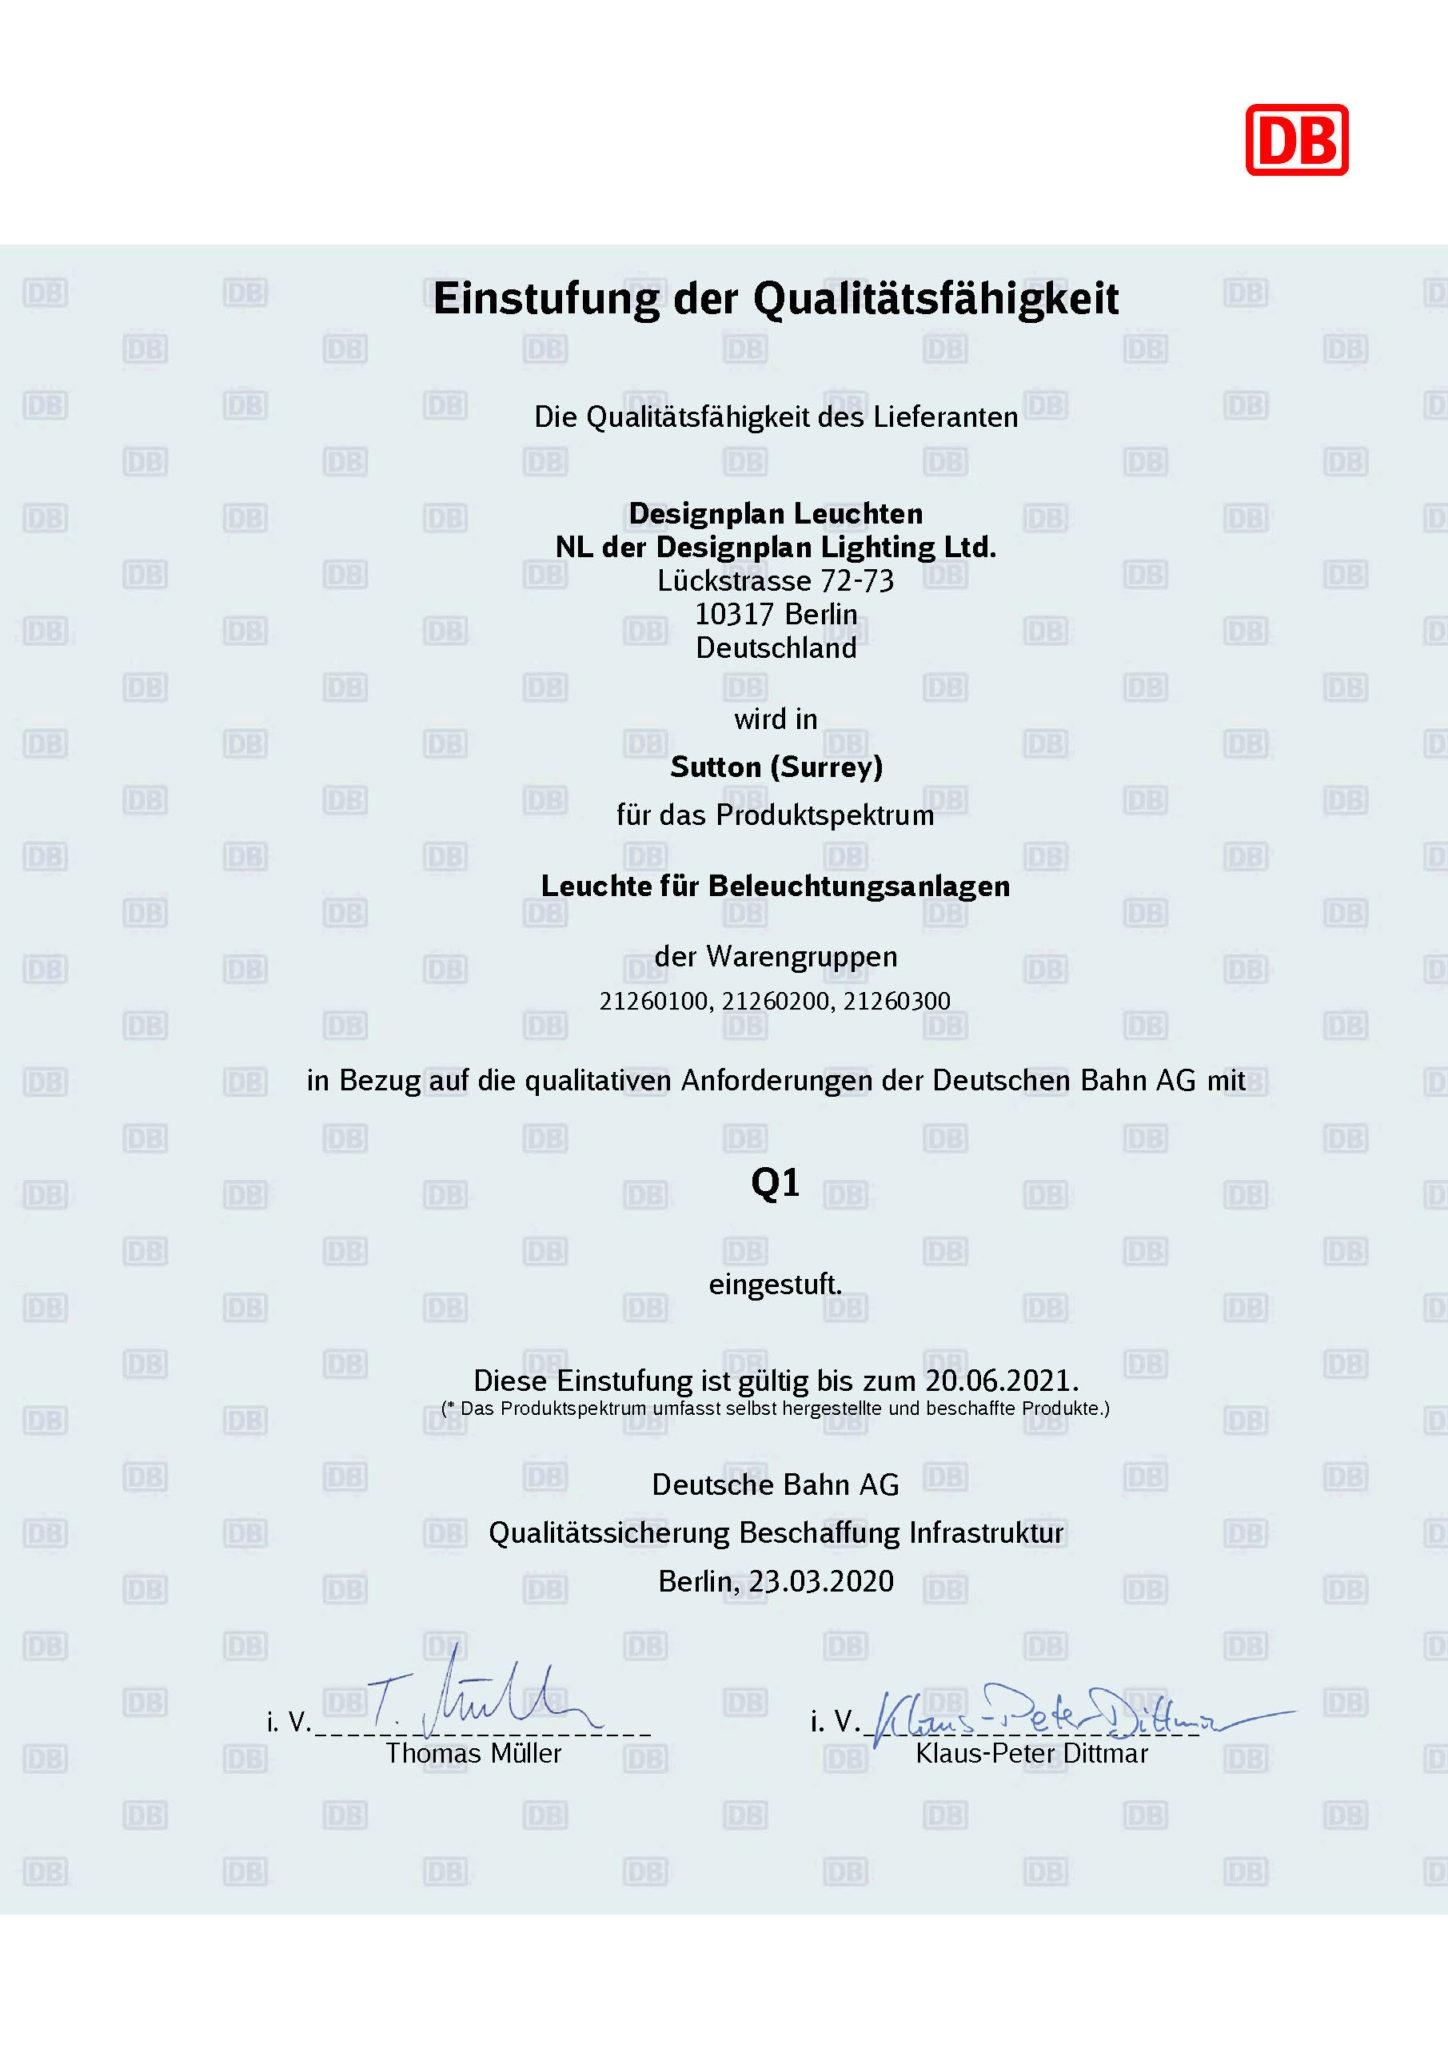 Deutsche Bahn zertifiziert